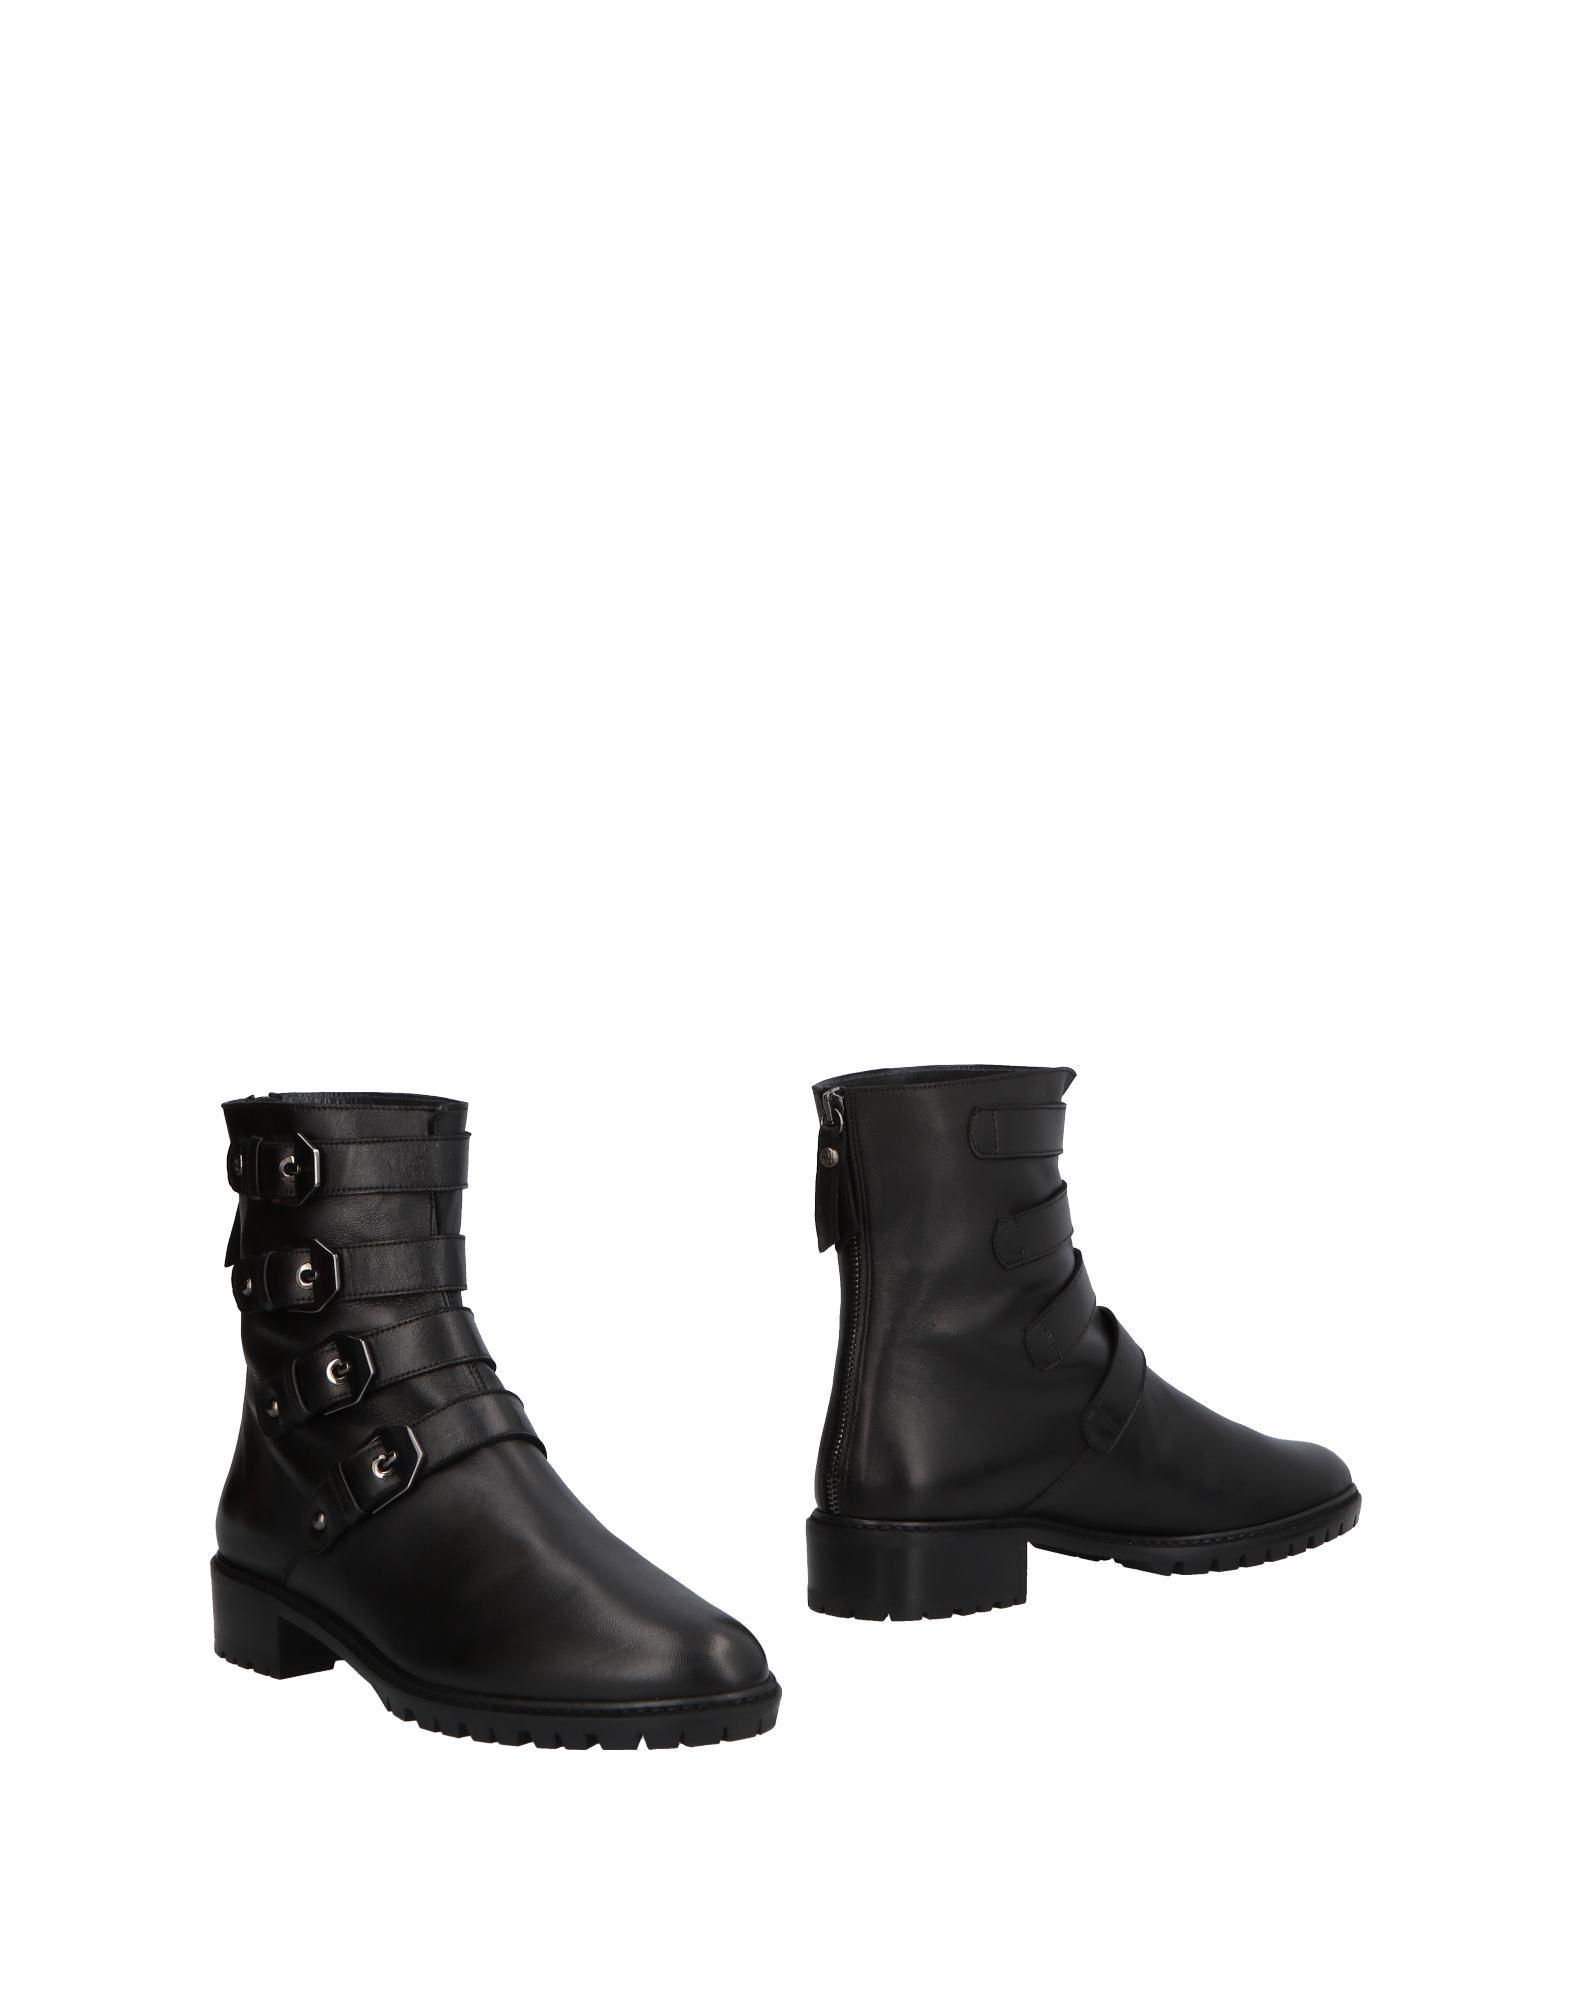 Stuart Weitzman Ankle Boot Ankle - Women Stuart Weitzman Ankle Boot Boots online on  Australia - 11484500DE 791bda